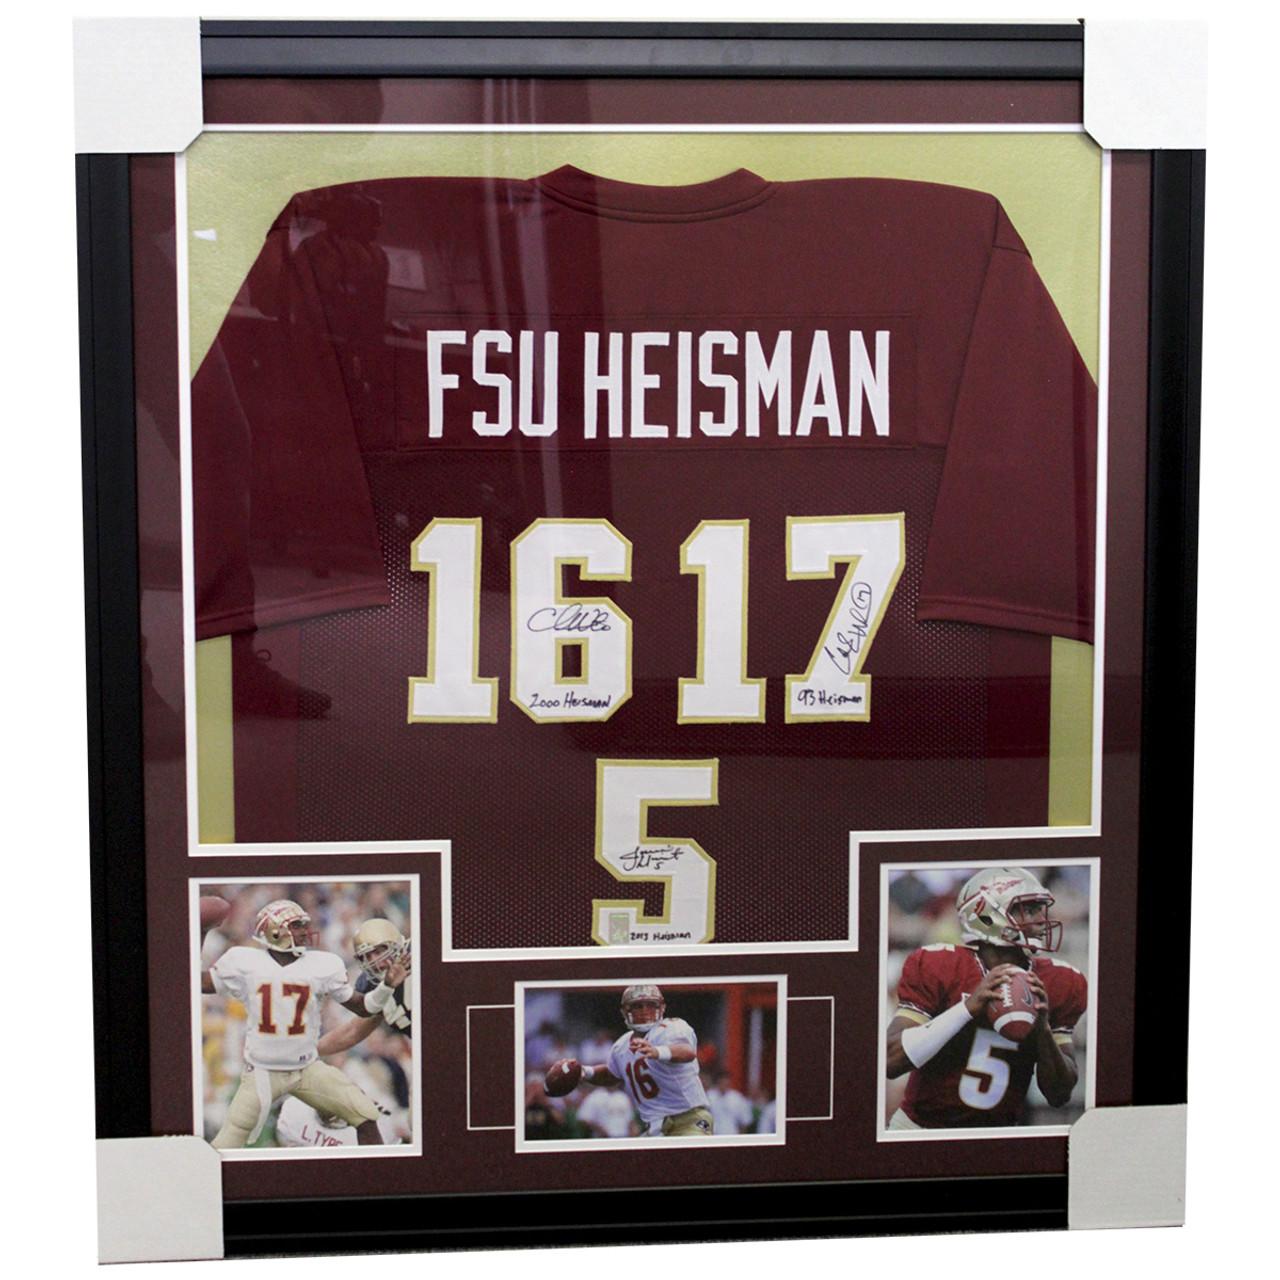 867088ad968 Florida State Seminoles 3 Heisman Framed Custom Garnet Jersey W ...